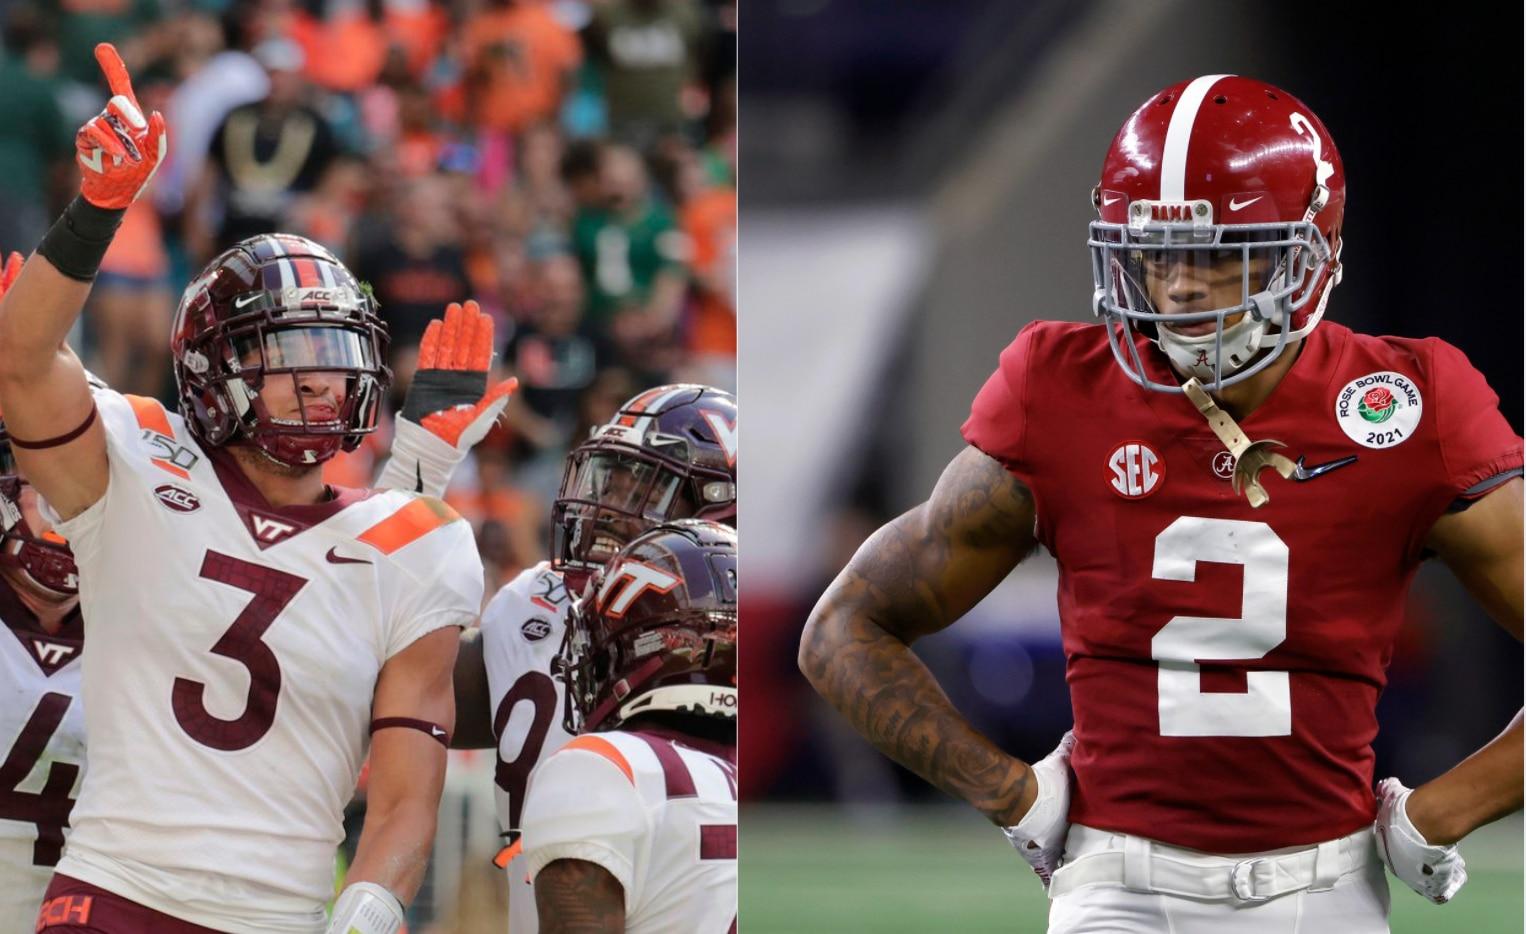 Virginia Tech CB Caleb Farley (left) and Alabama CB Patrick Surtain (right).